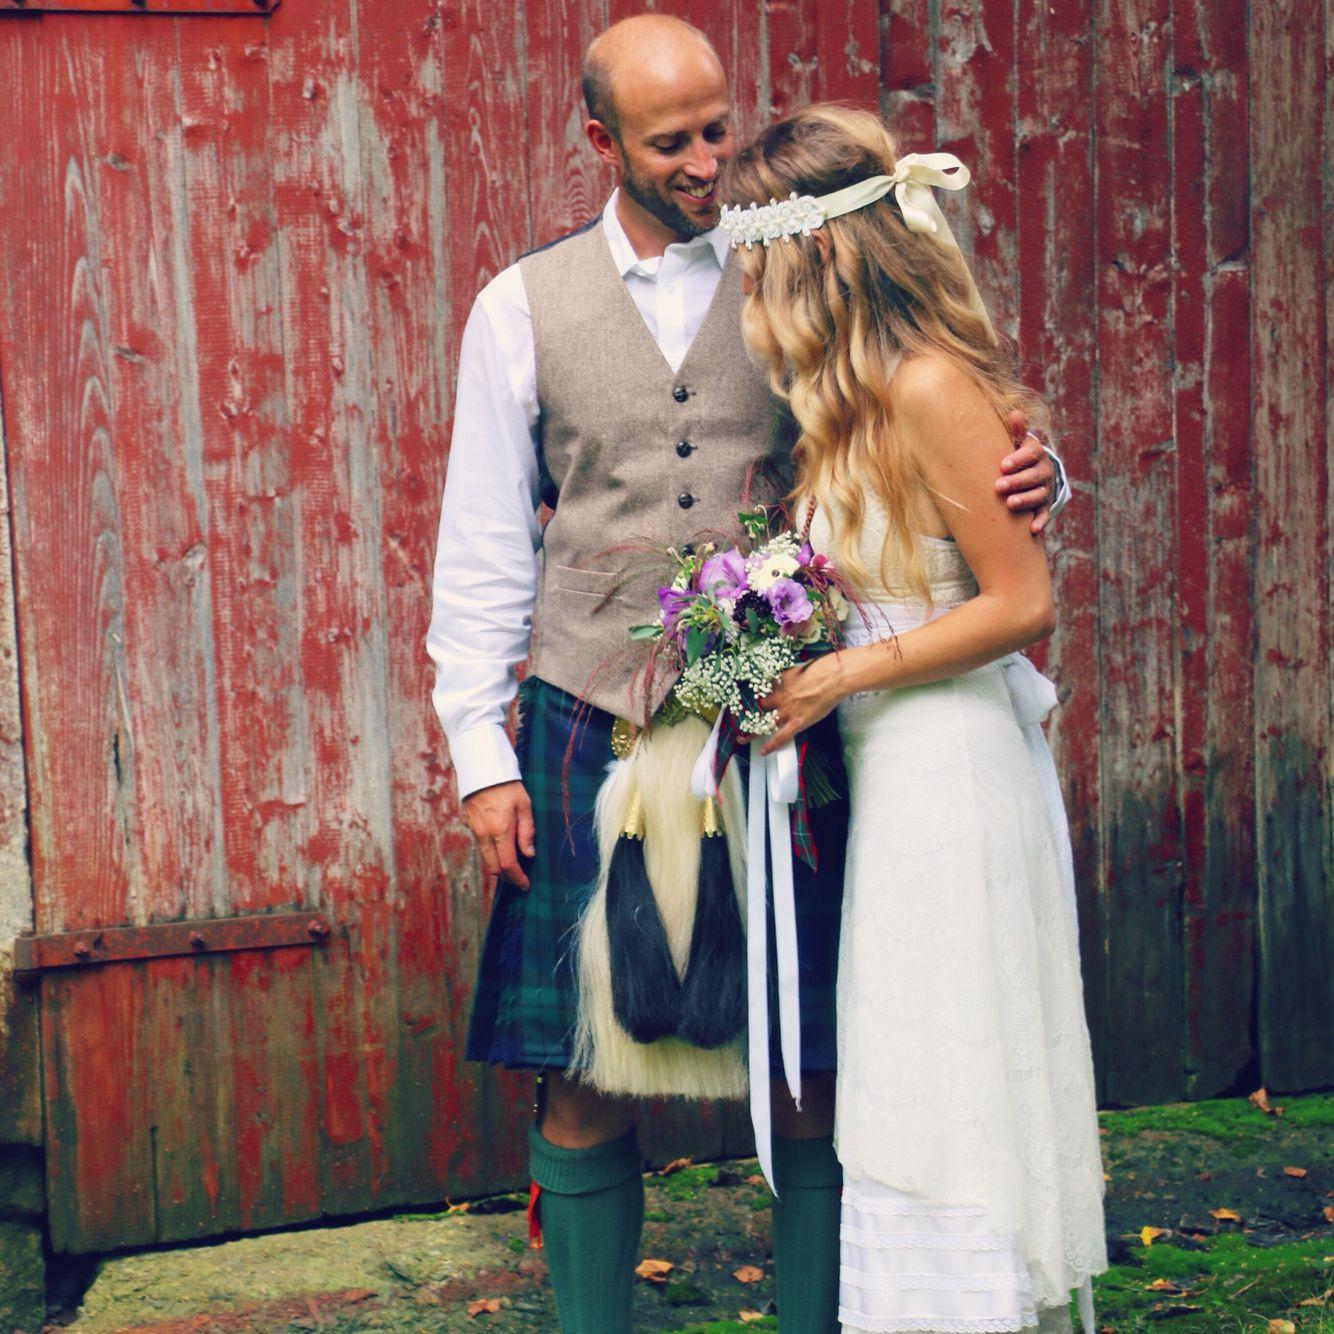 Groom In Kilt, Vintage Wedding Dress, Barn Wedding